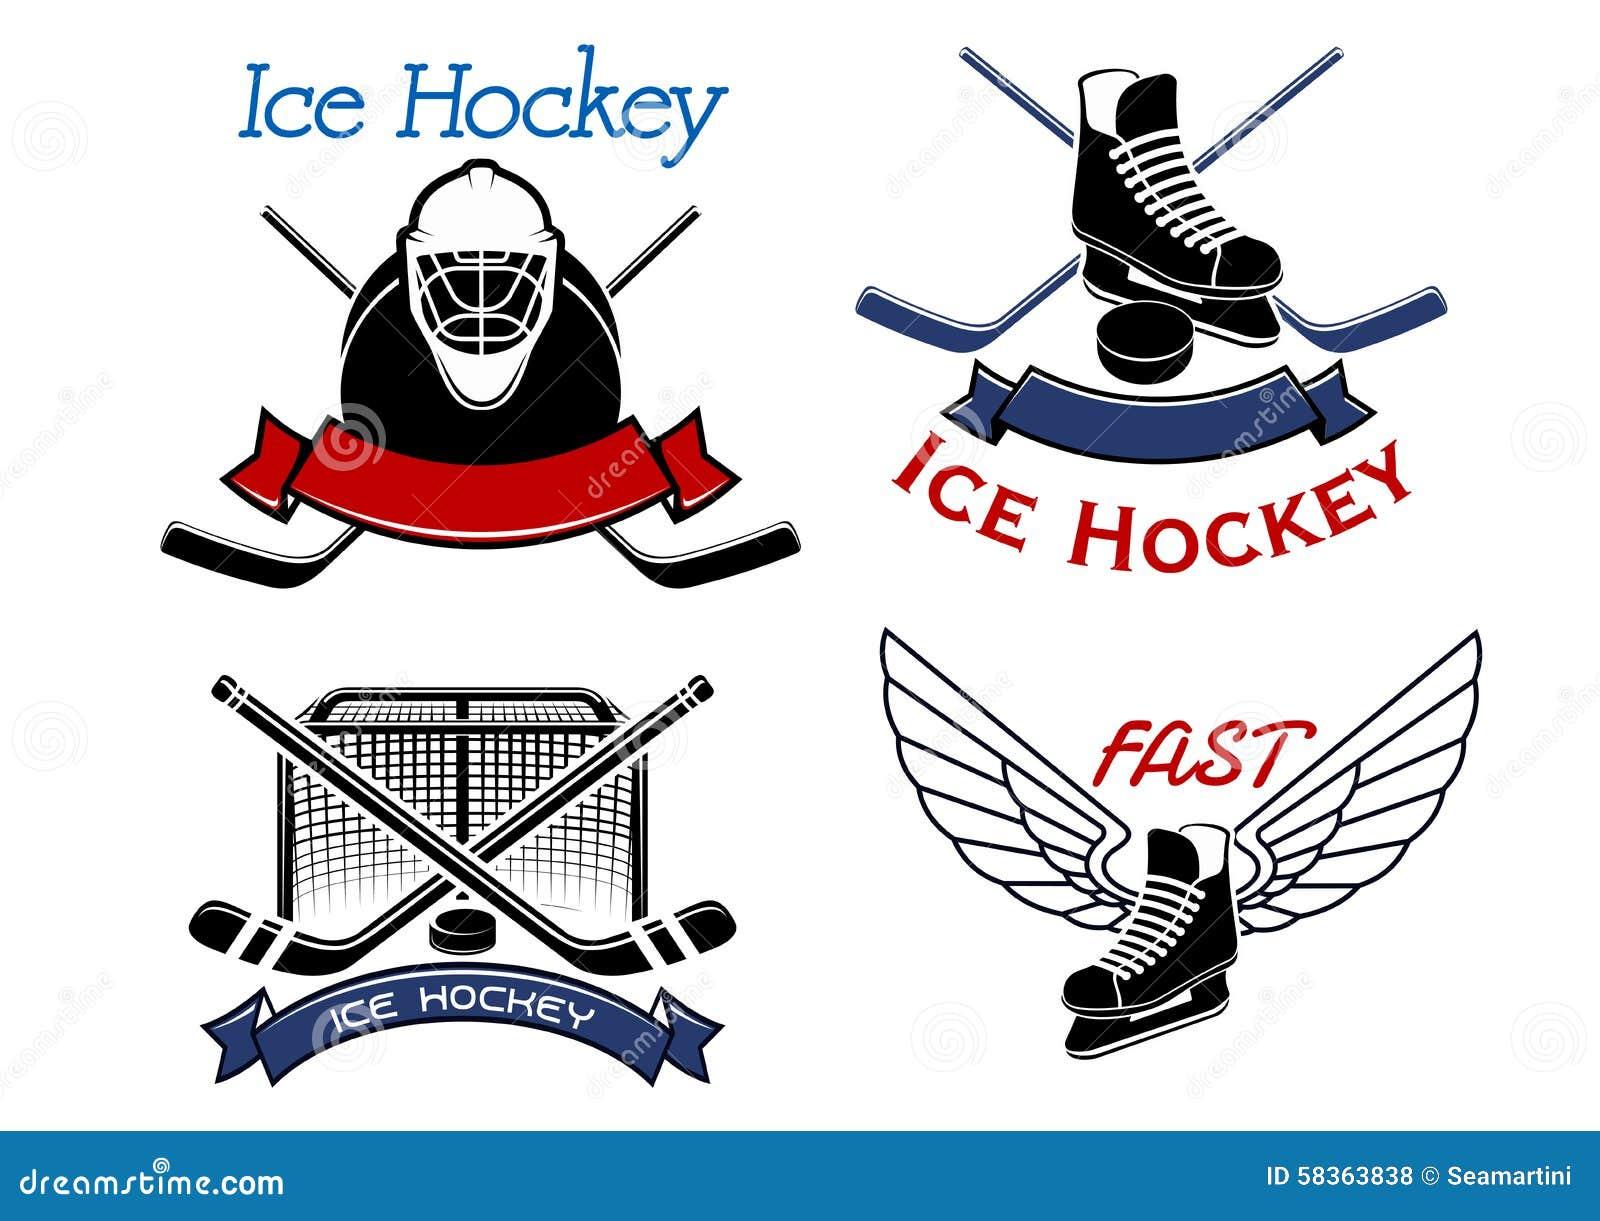 ice hockey sport icons and symbols stock vector image hockey stick vector art ccm vector hockey stick